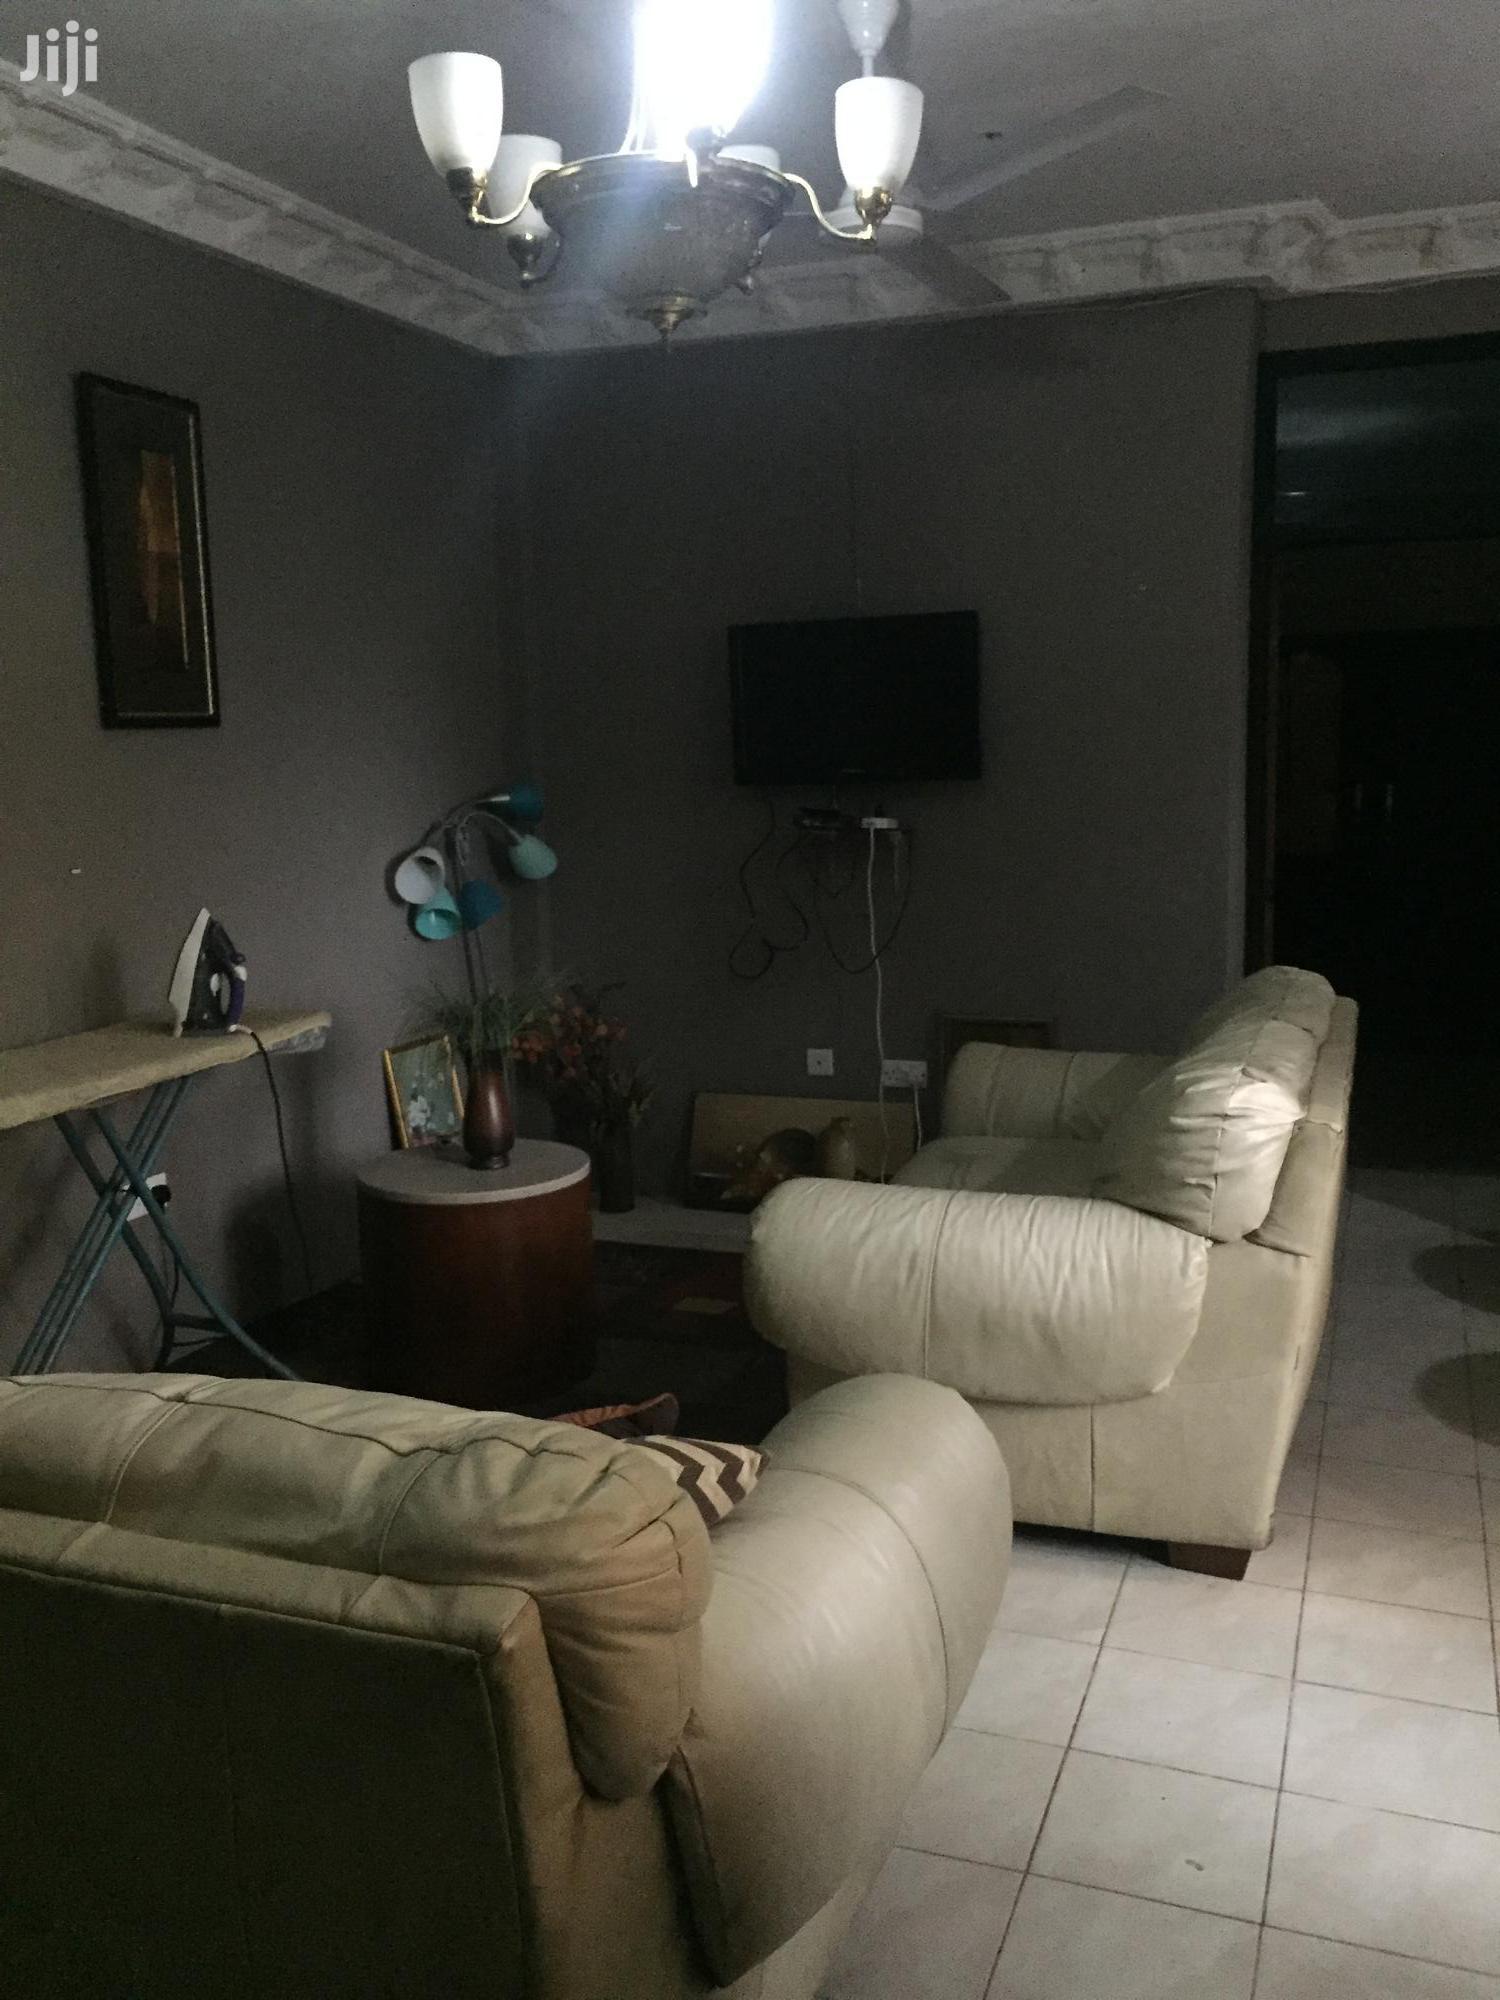 2 Bedroom Fully Furnished @Nmai Djorn Zoomlion Headoffice